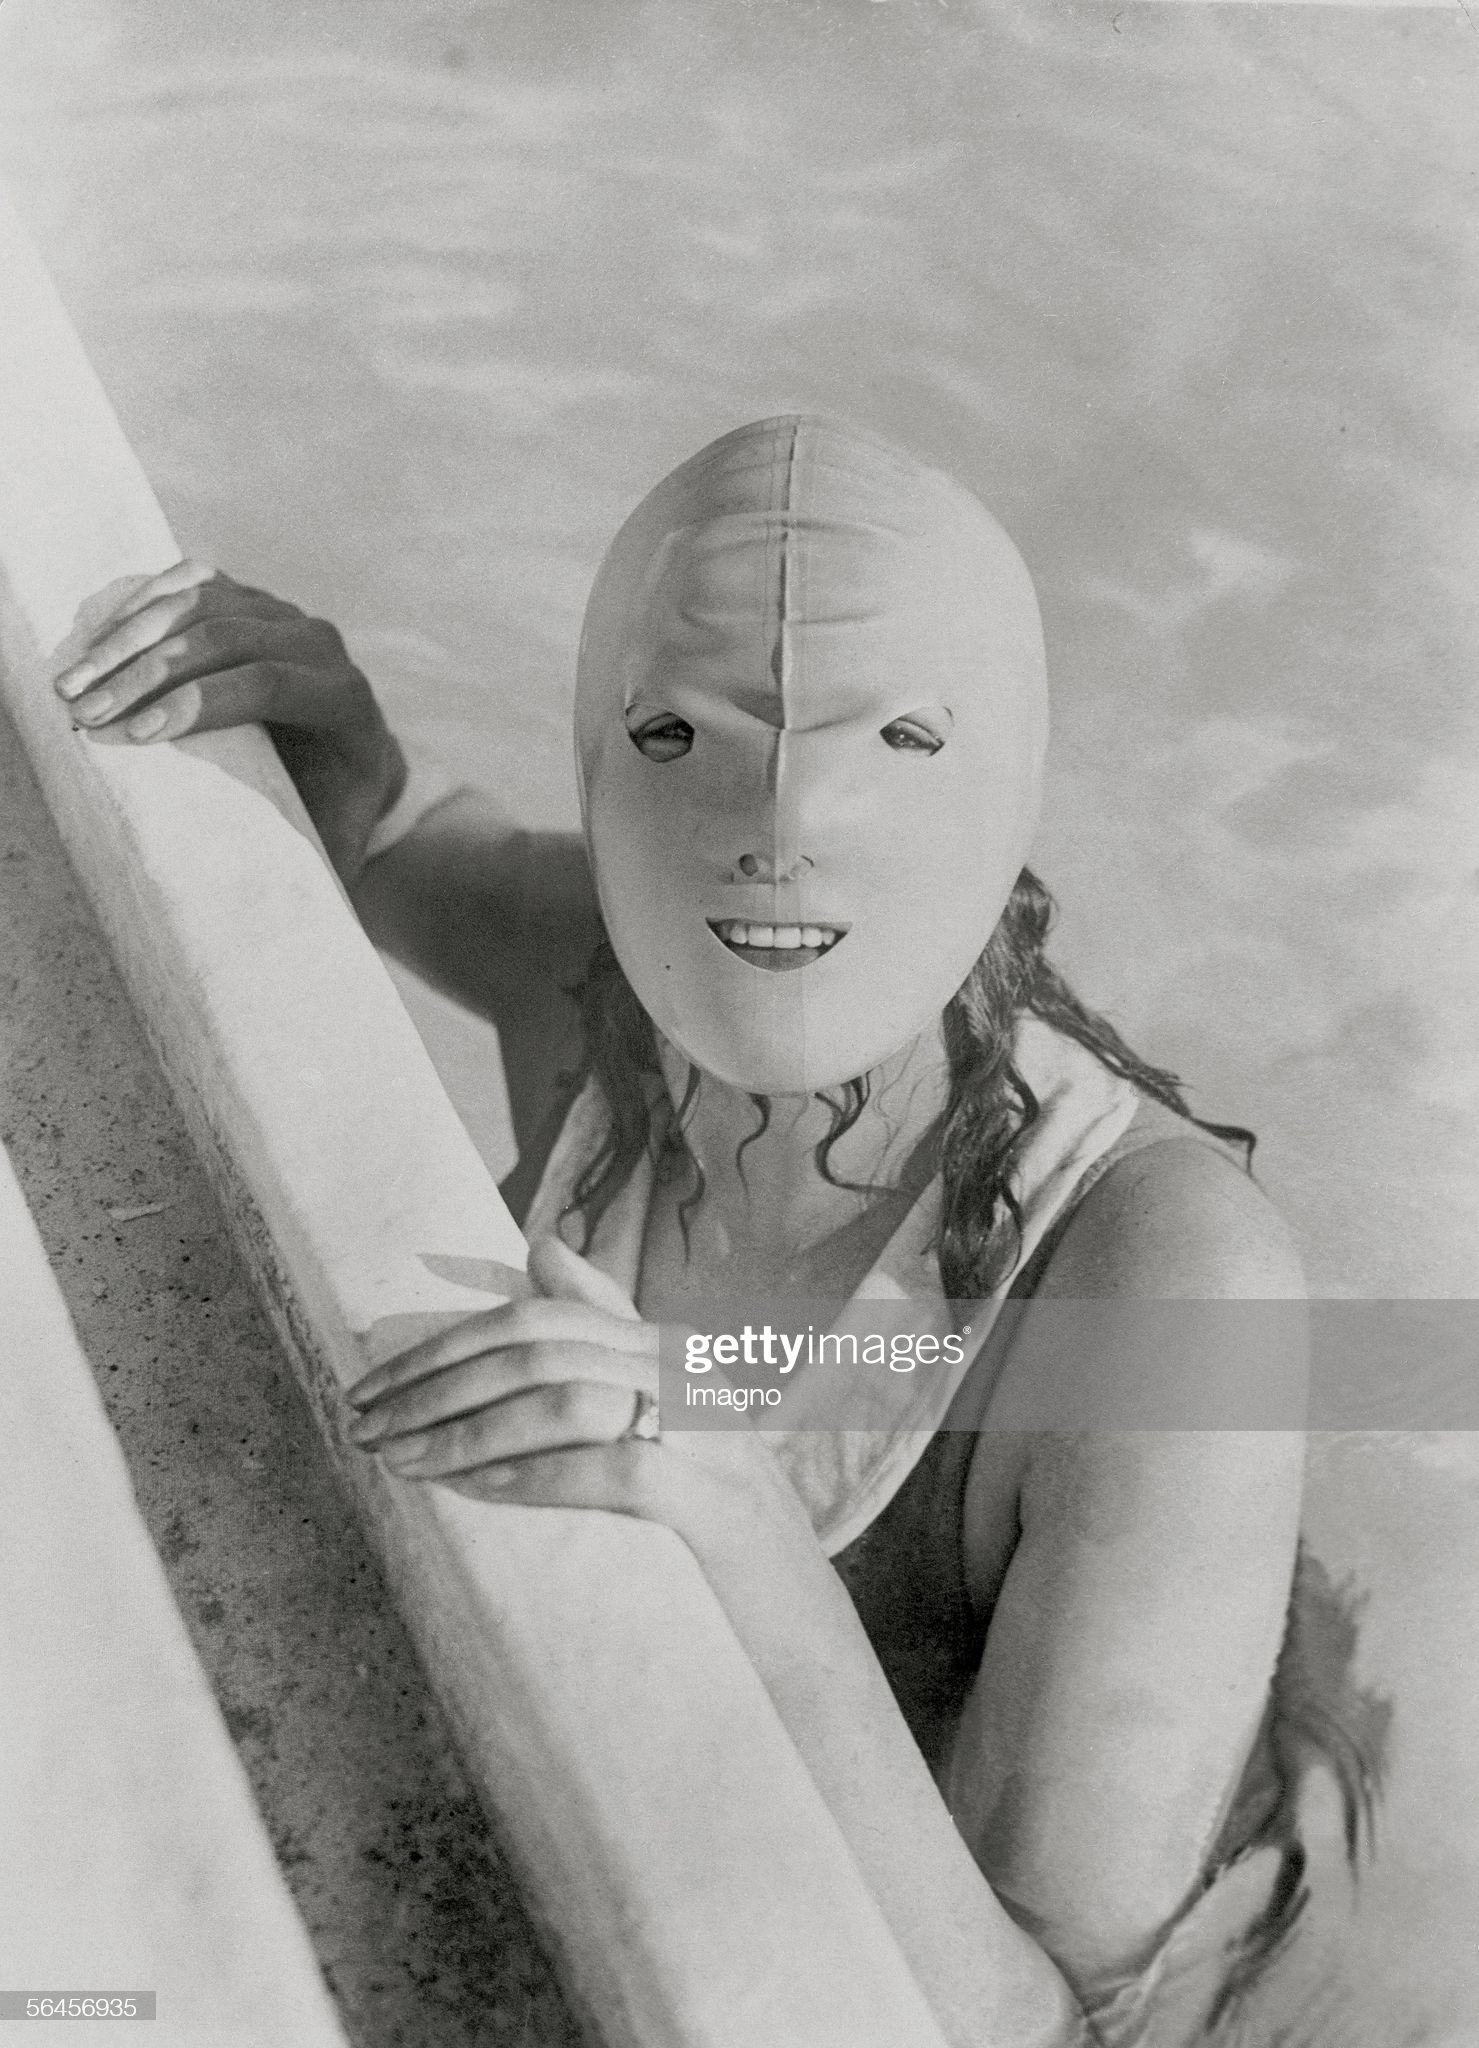 Girl with plastic mask : News Photo